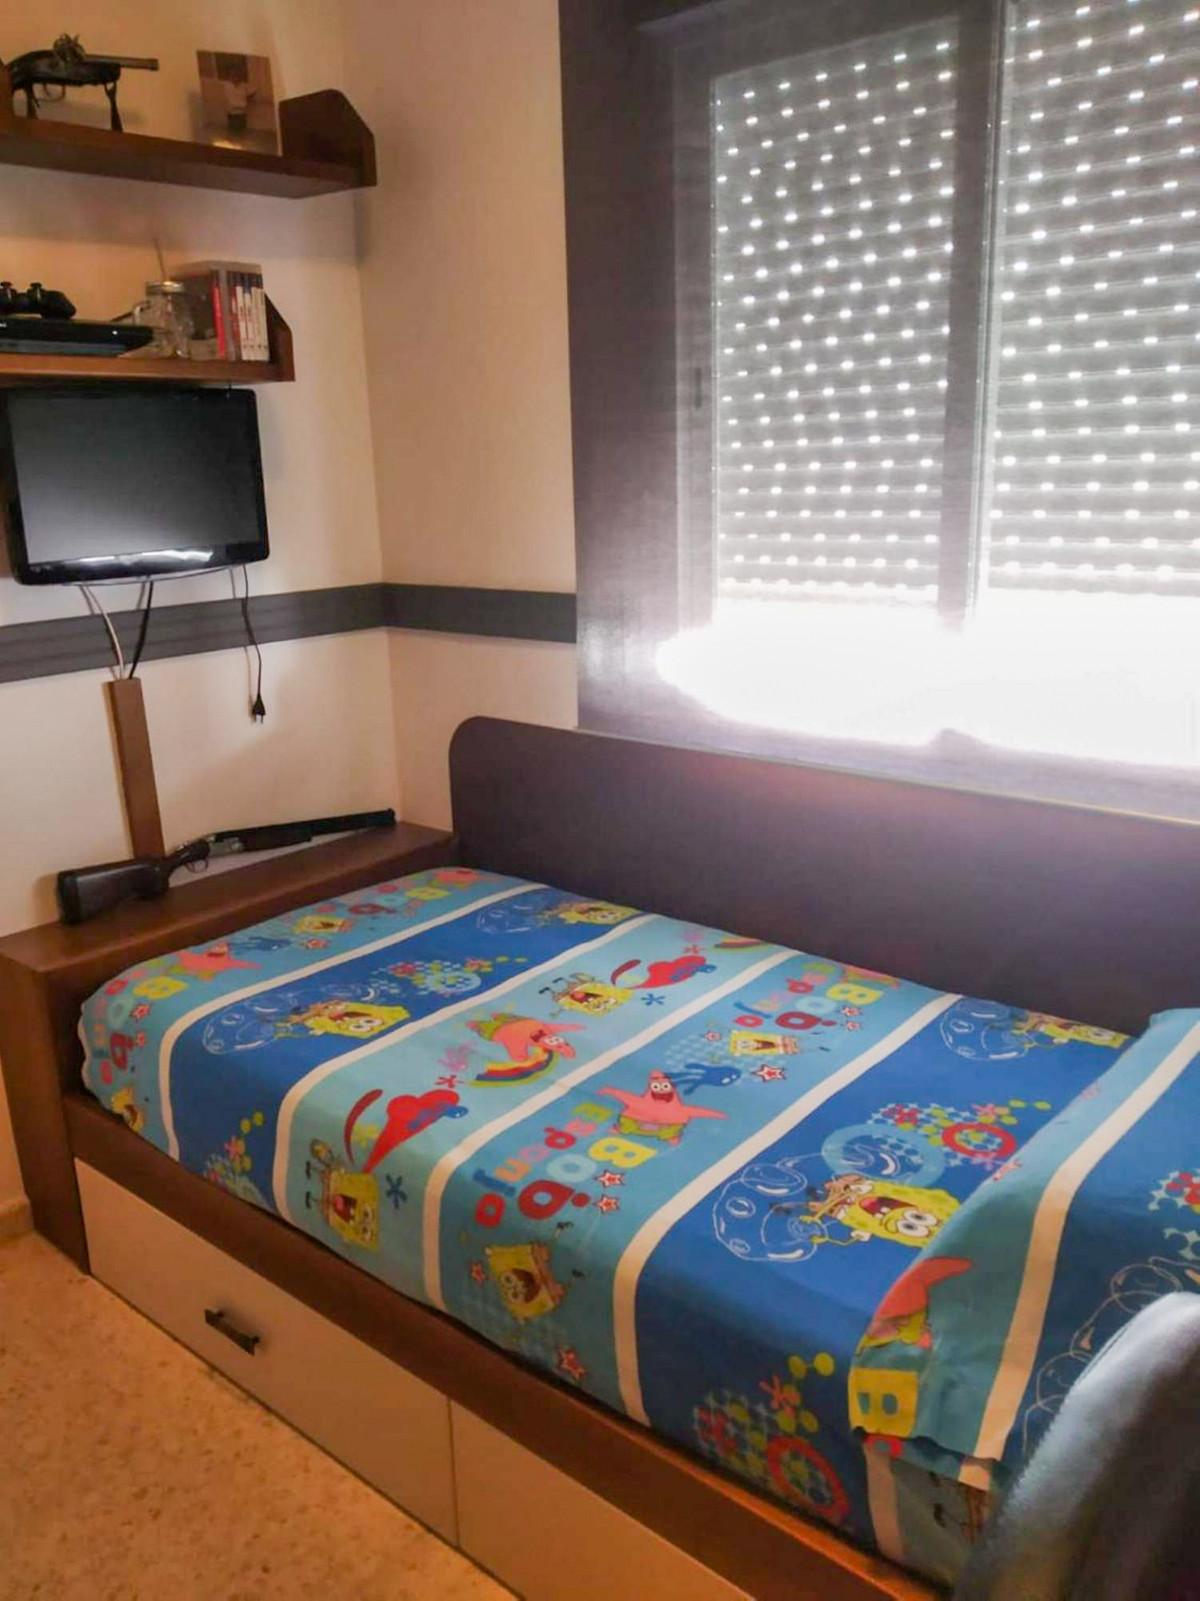 3 Bedroom Townhouse For Sale, Manilva